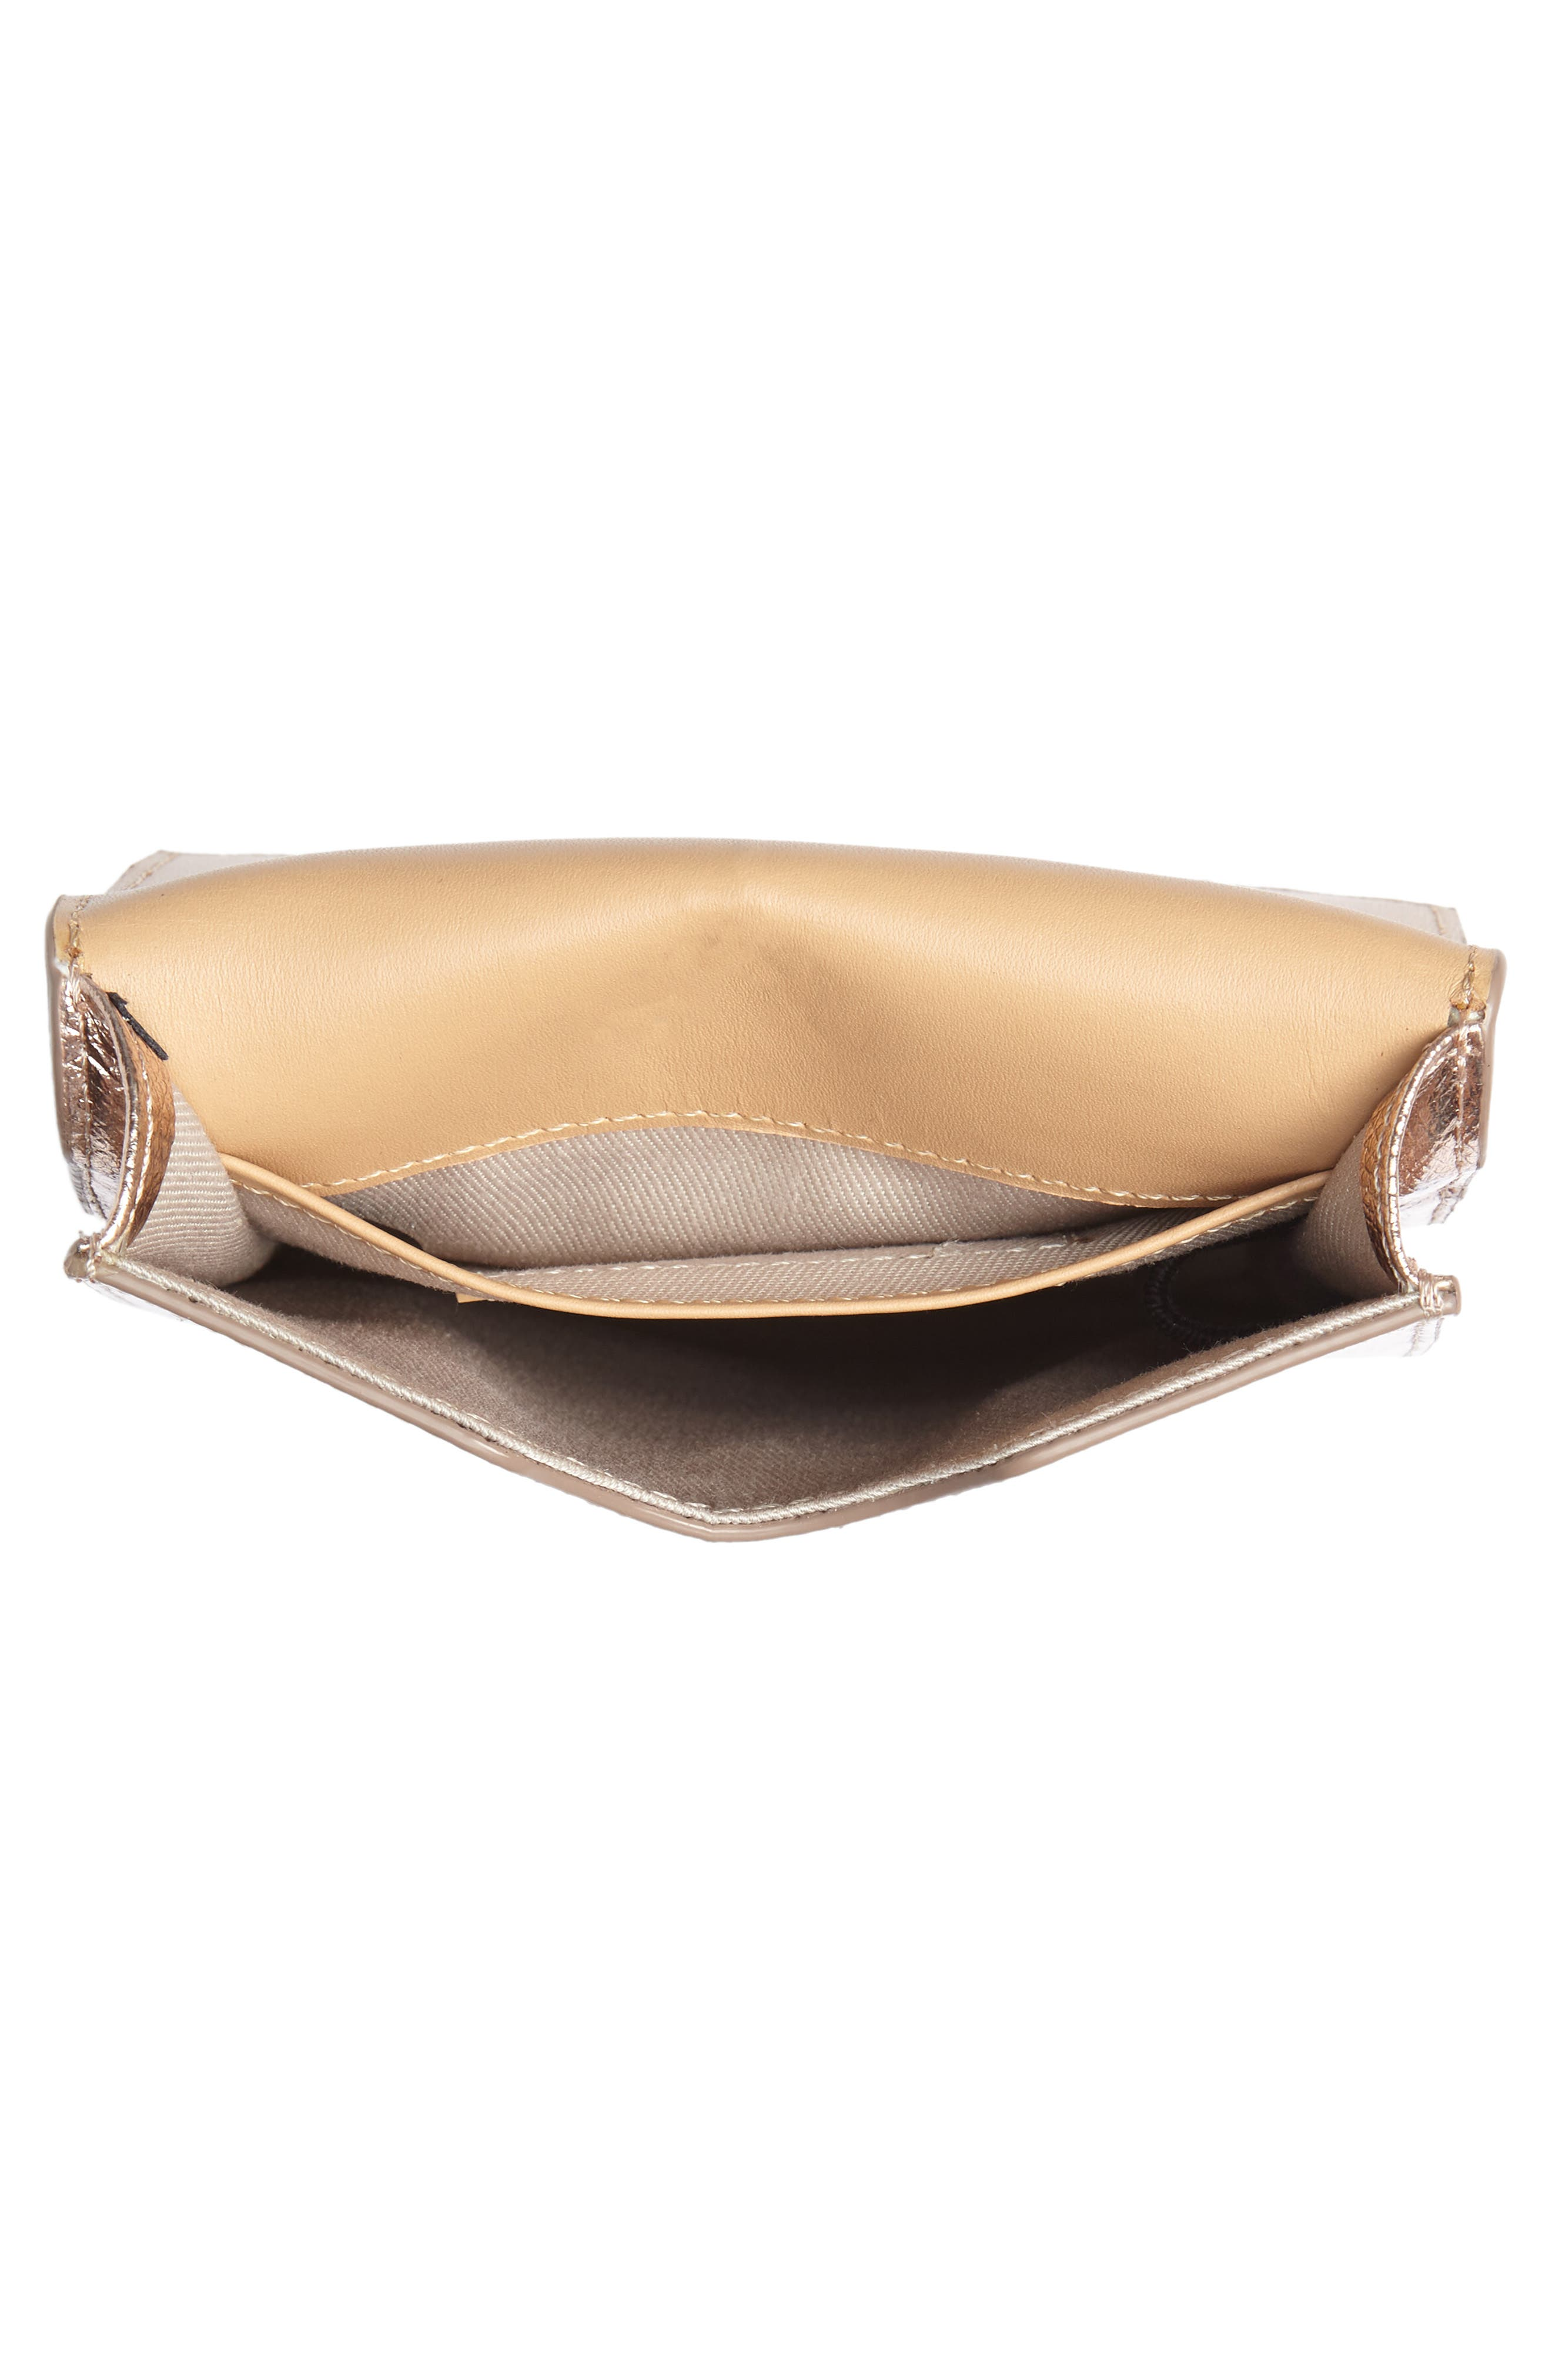 Metallic Leather Phone Crossbody Bag,                             Alternate thumbnail 4, color,                             220